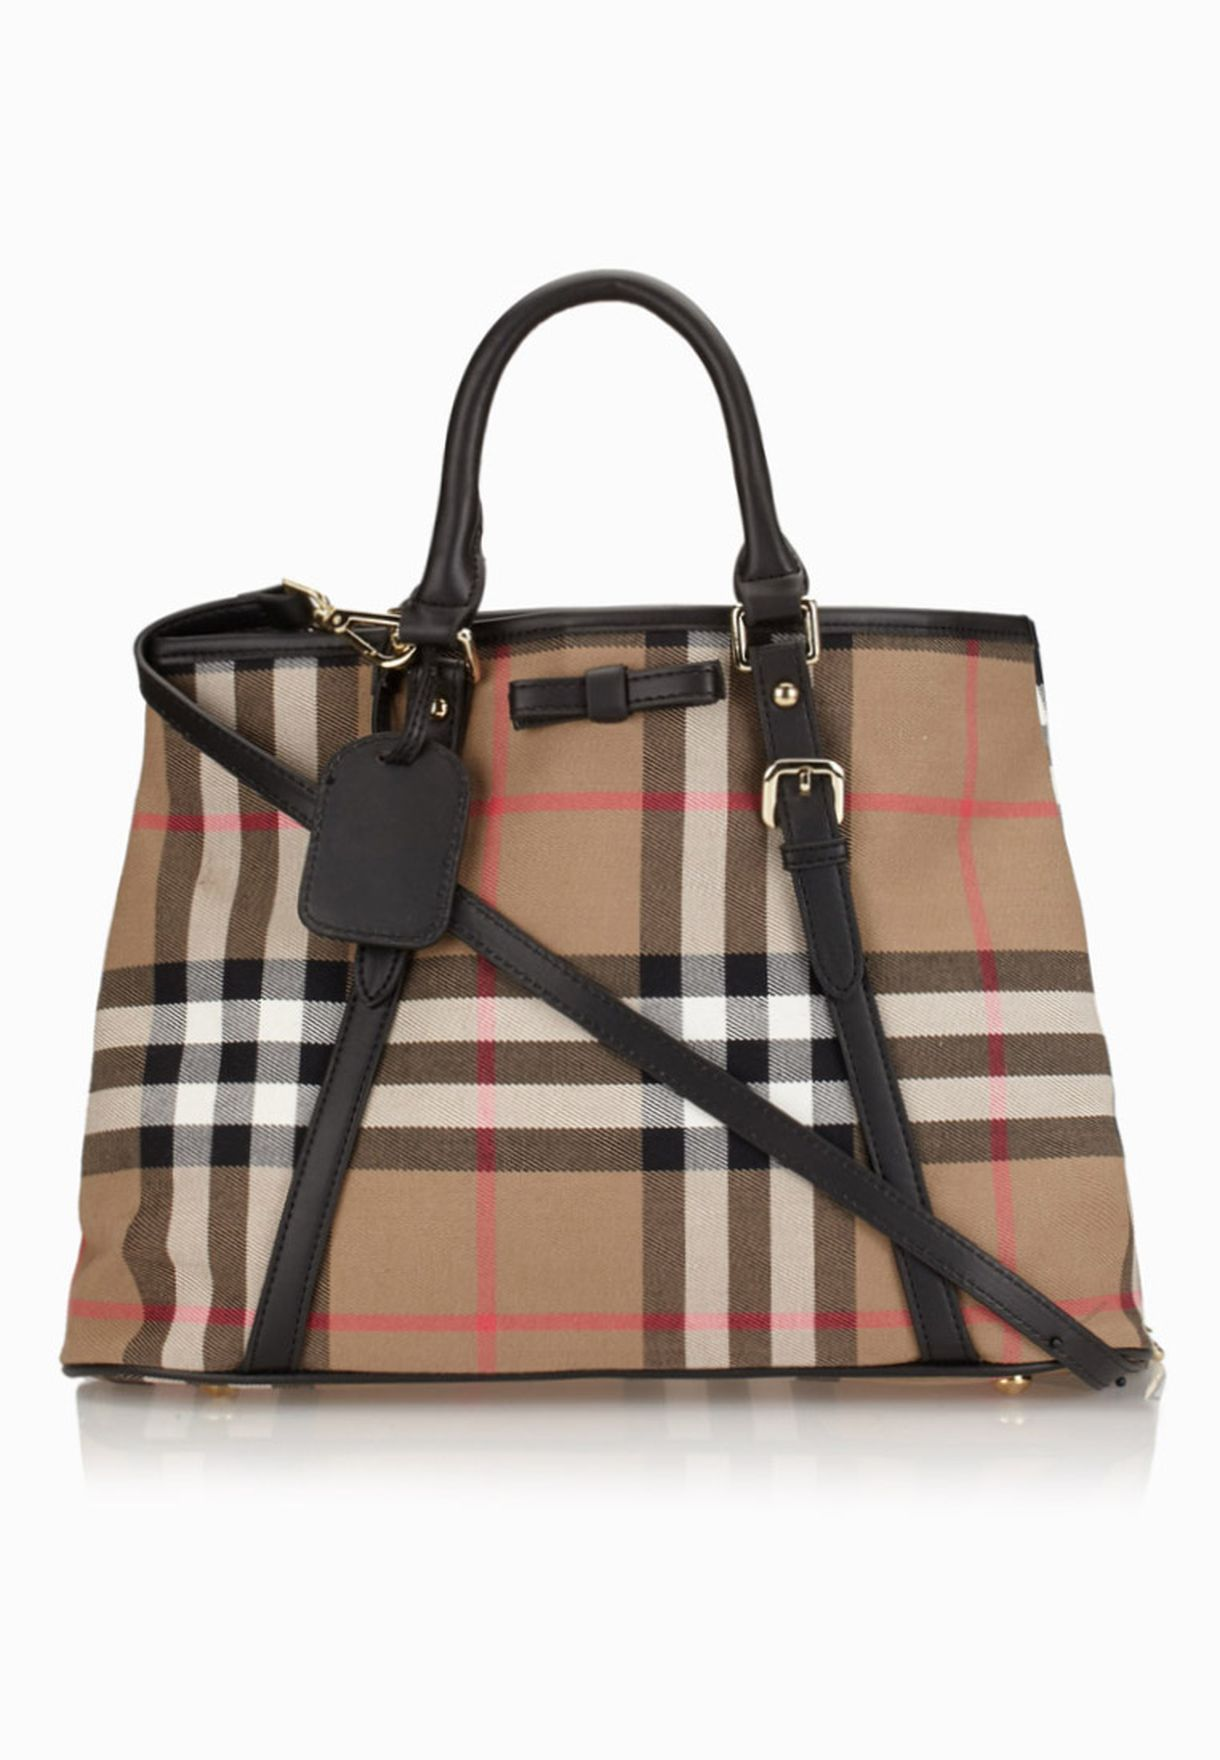 a002a841f3d45 تسوق حقيبة تسوق بطبعات مربعات ماركة جينجر لون browns في قطر ...